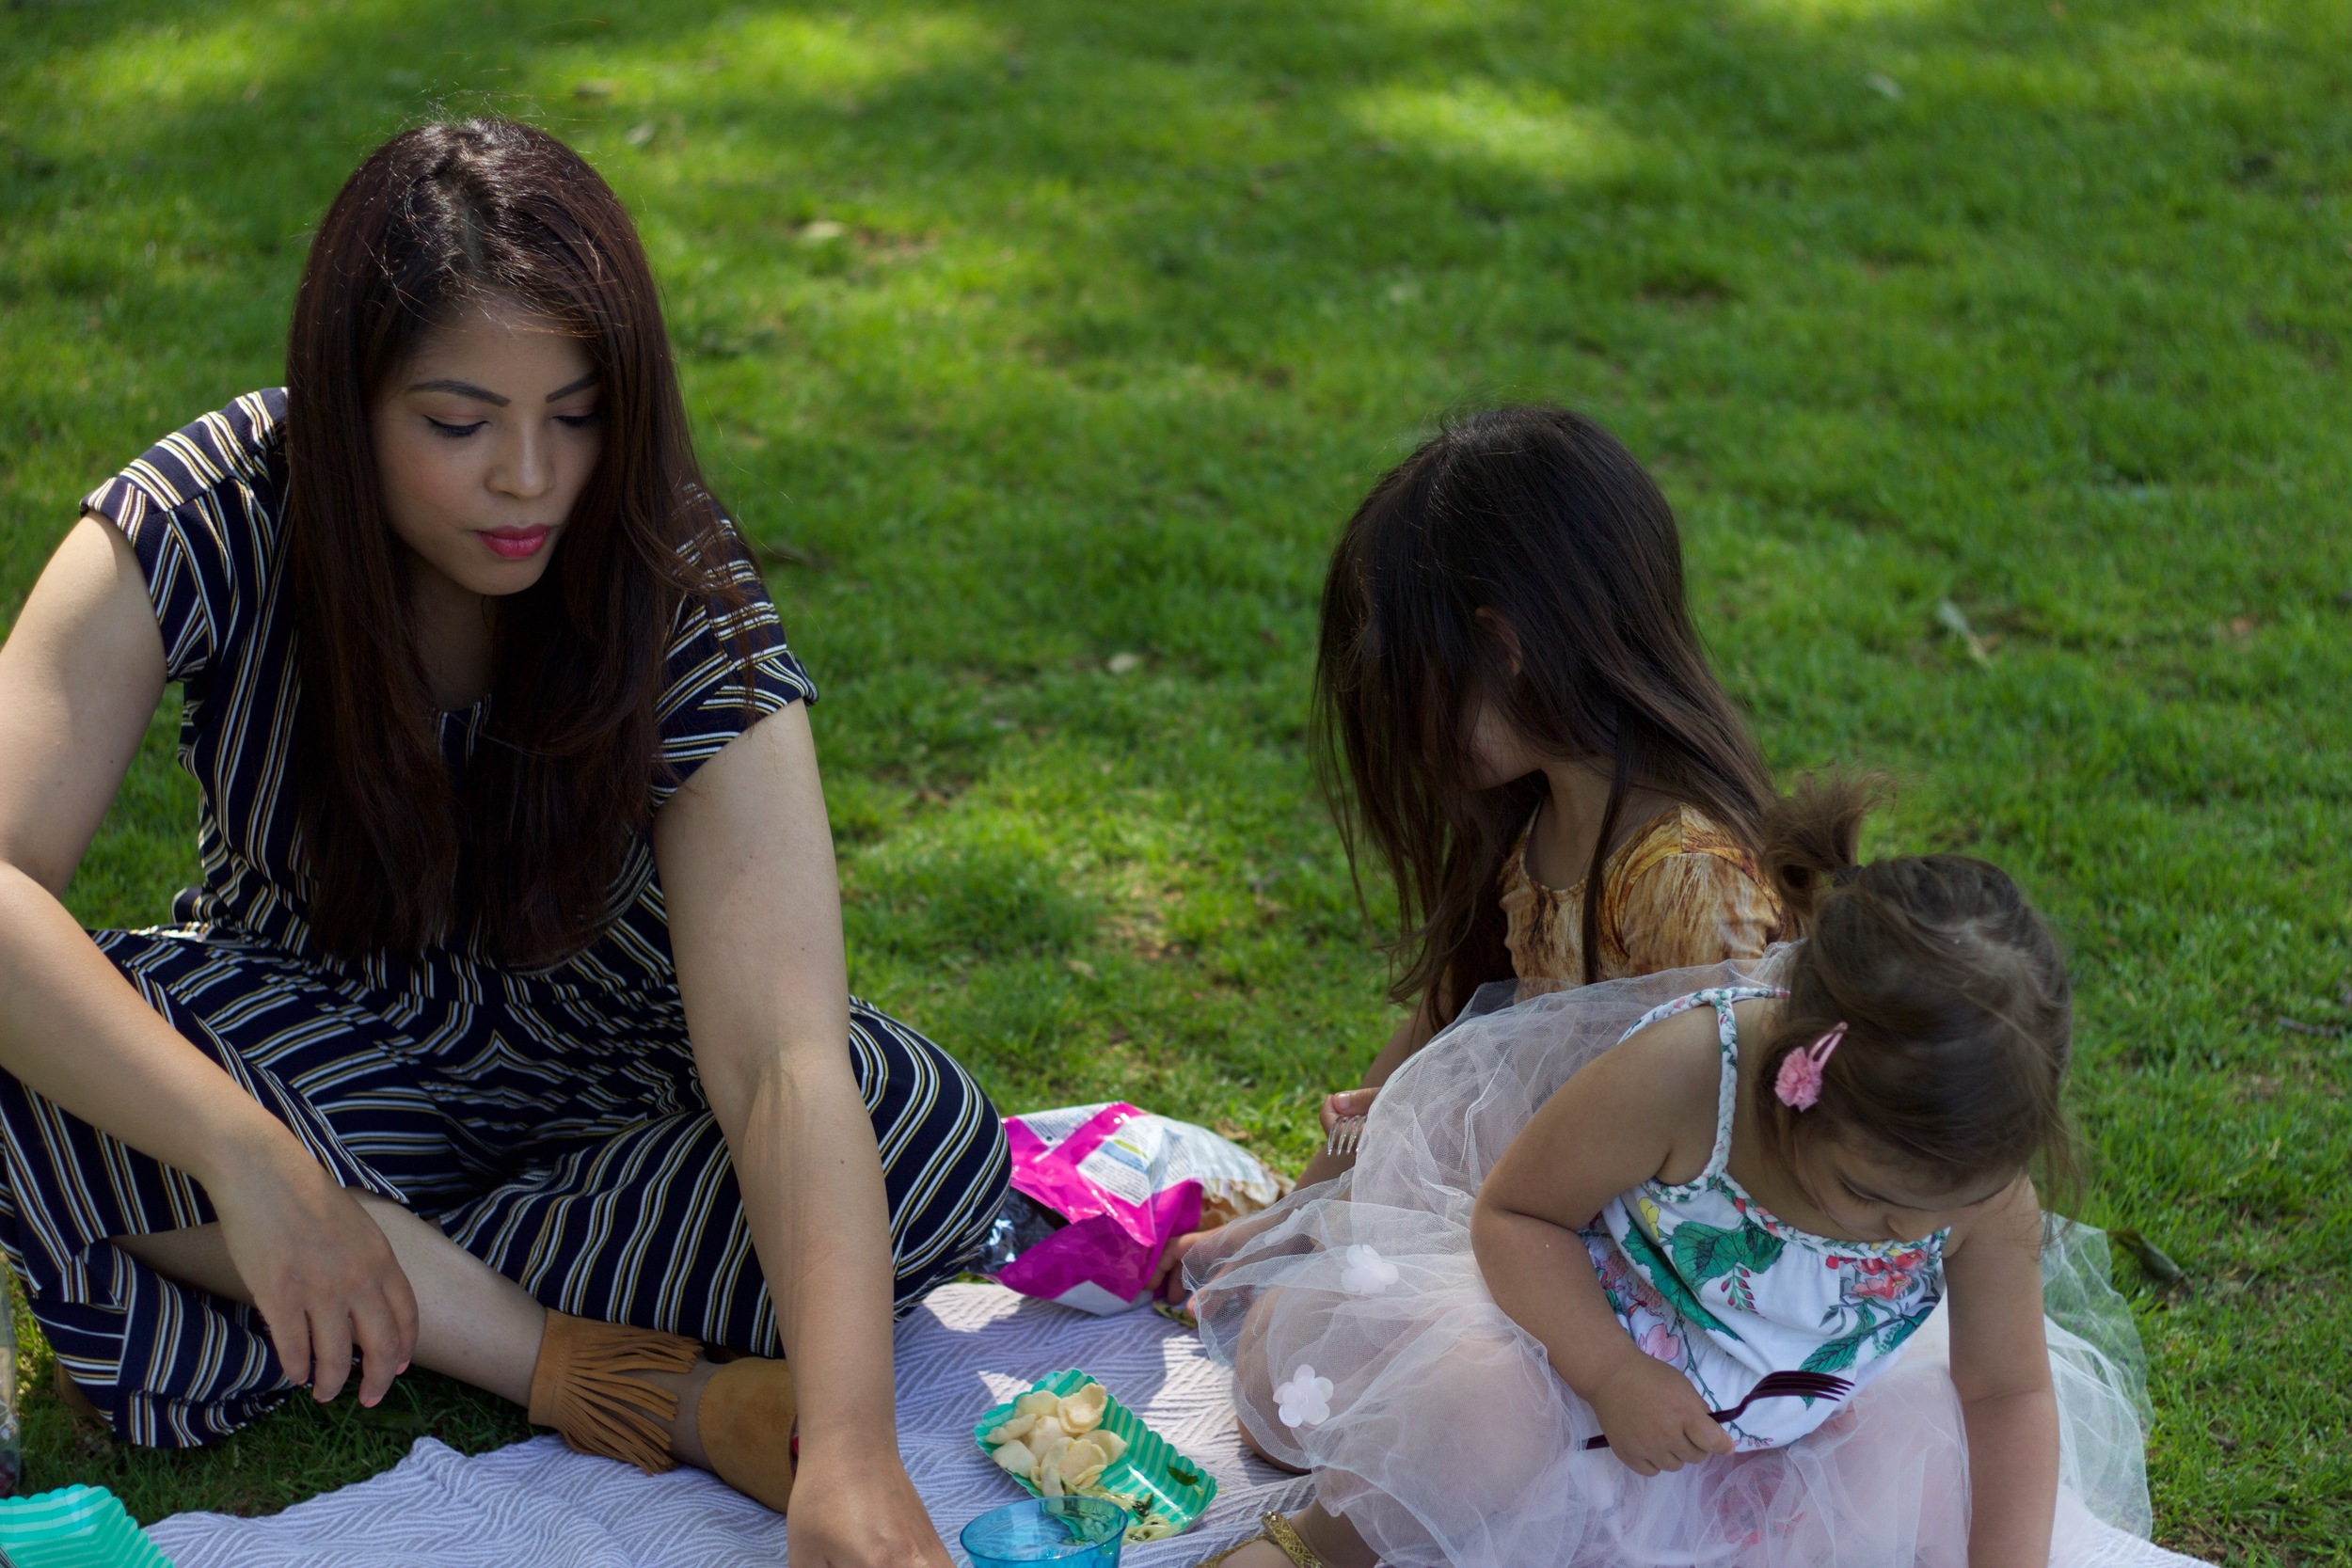 battersea park picnic